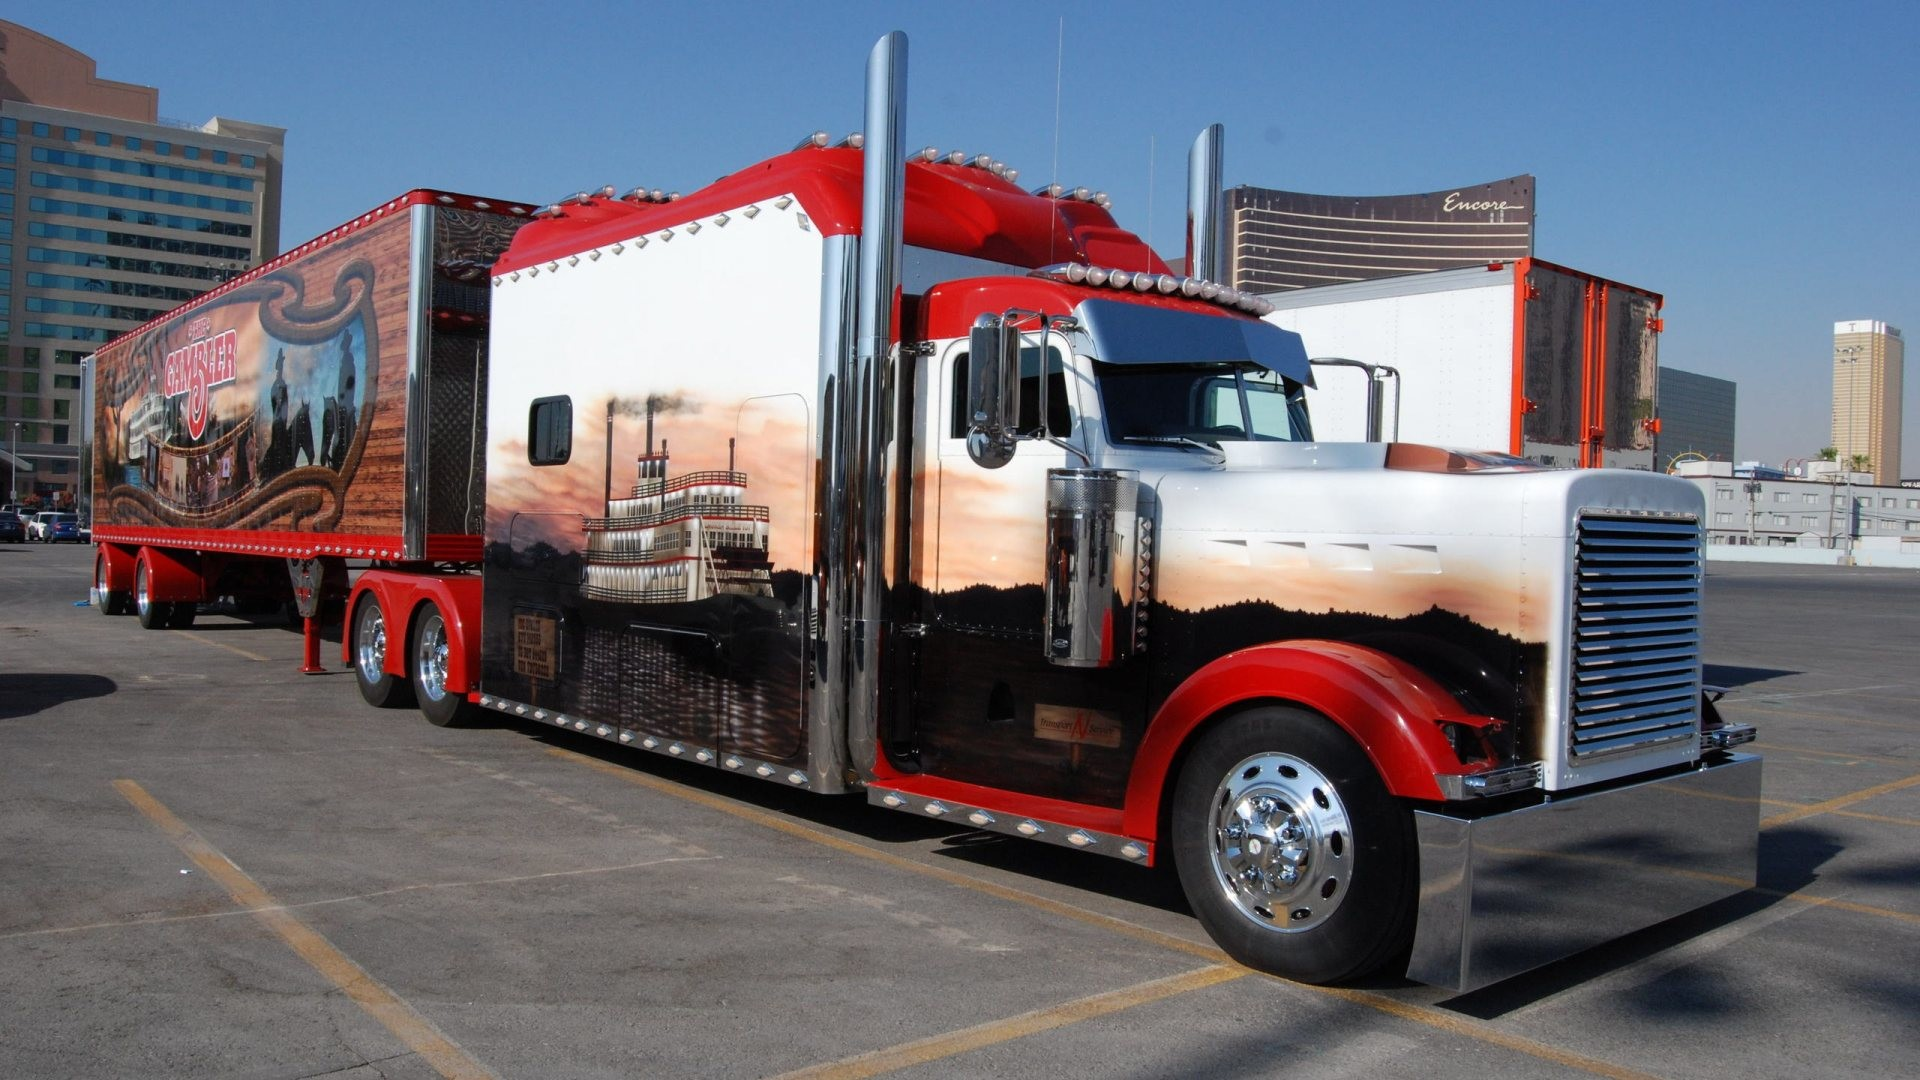 Used International Trucks and Tractors for Sale  Penske